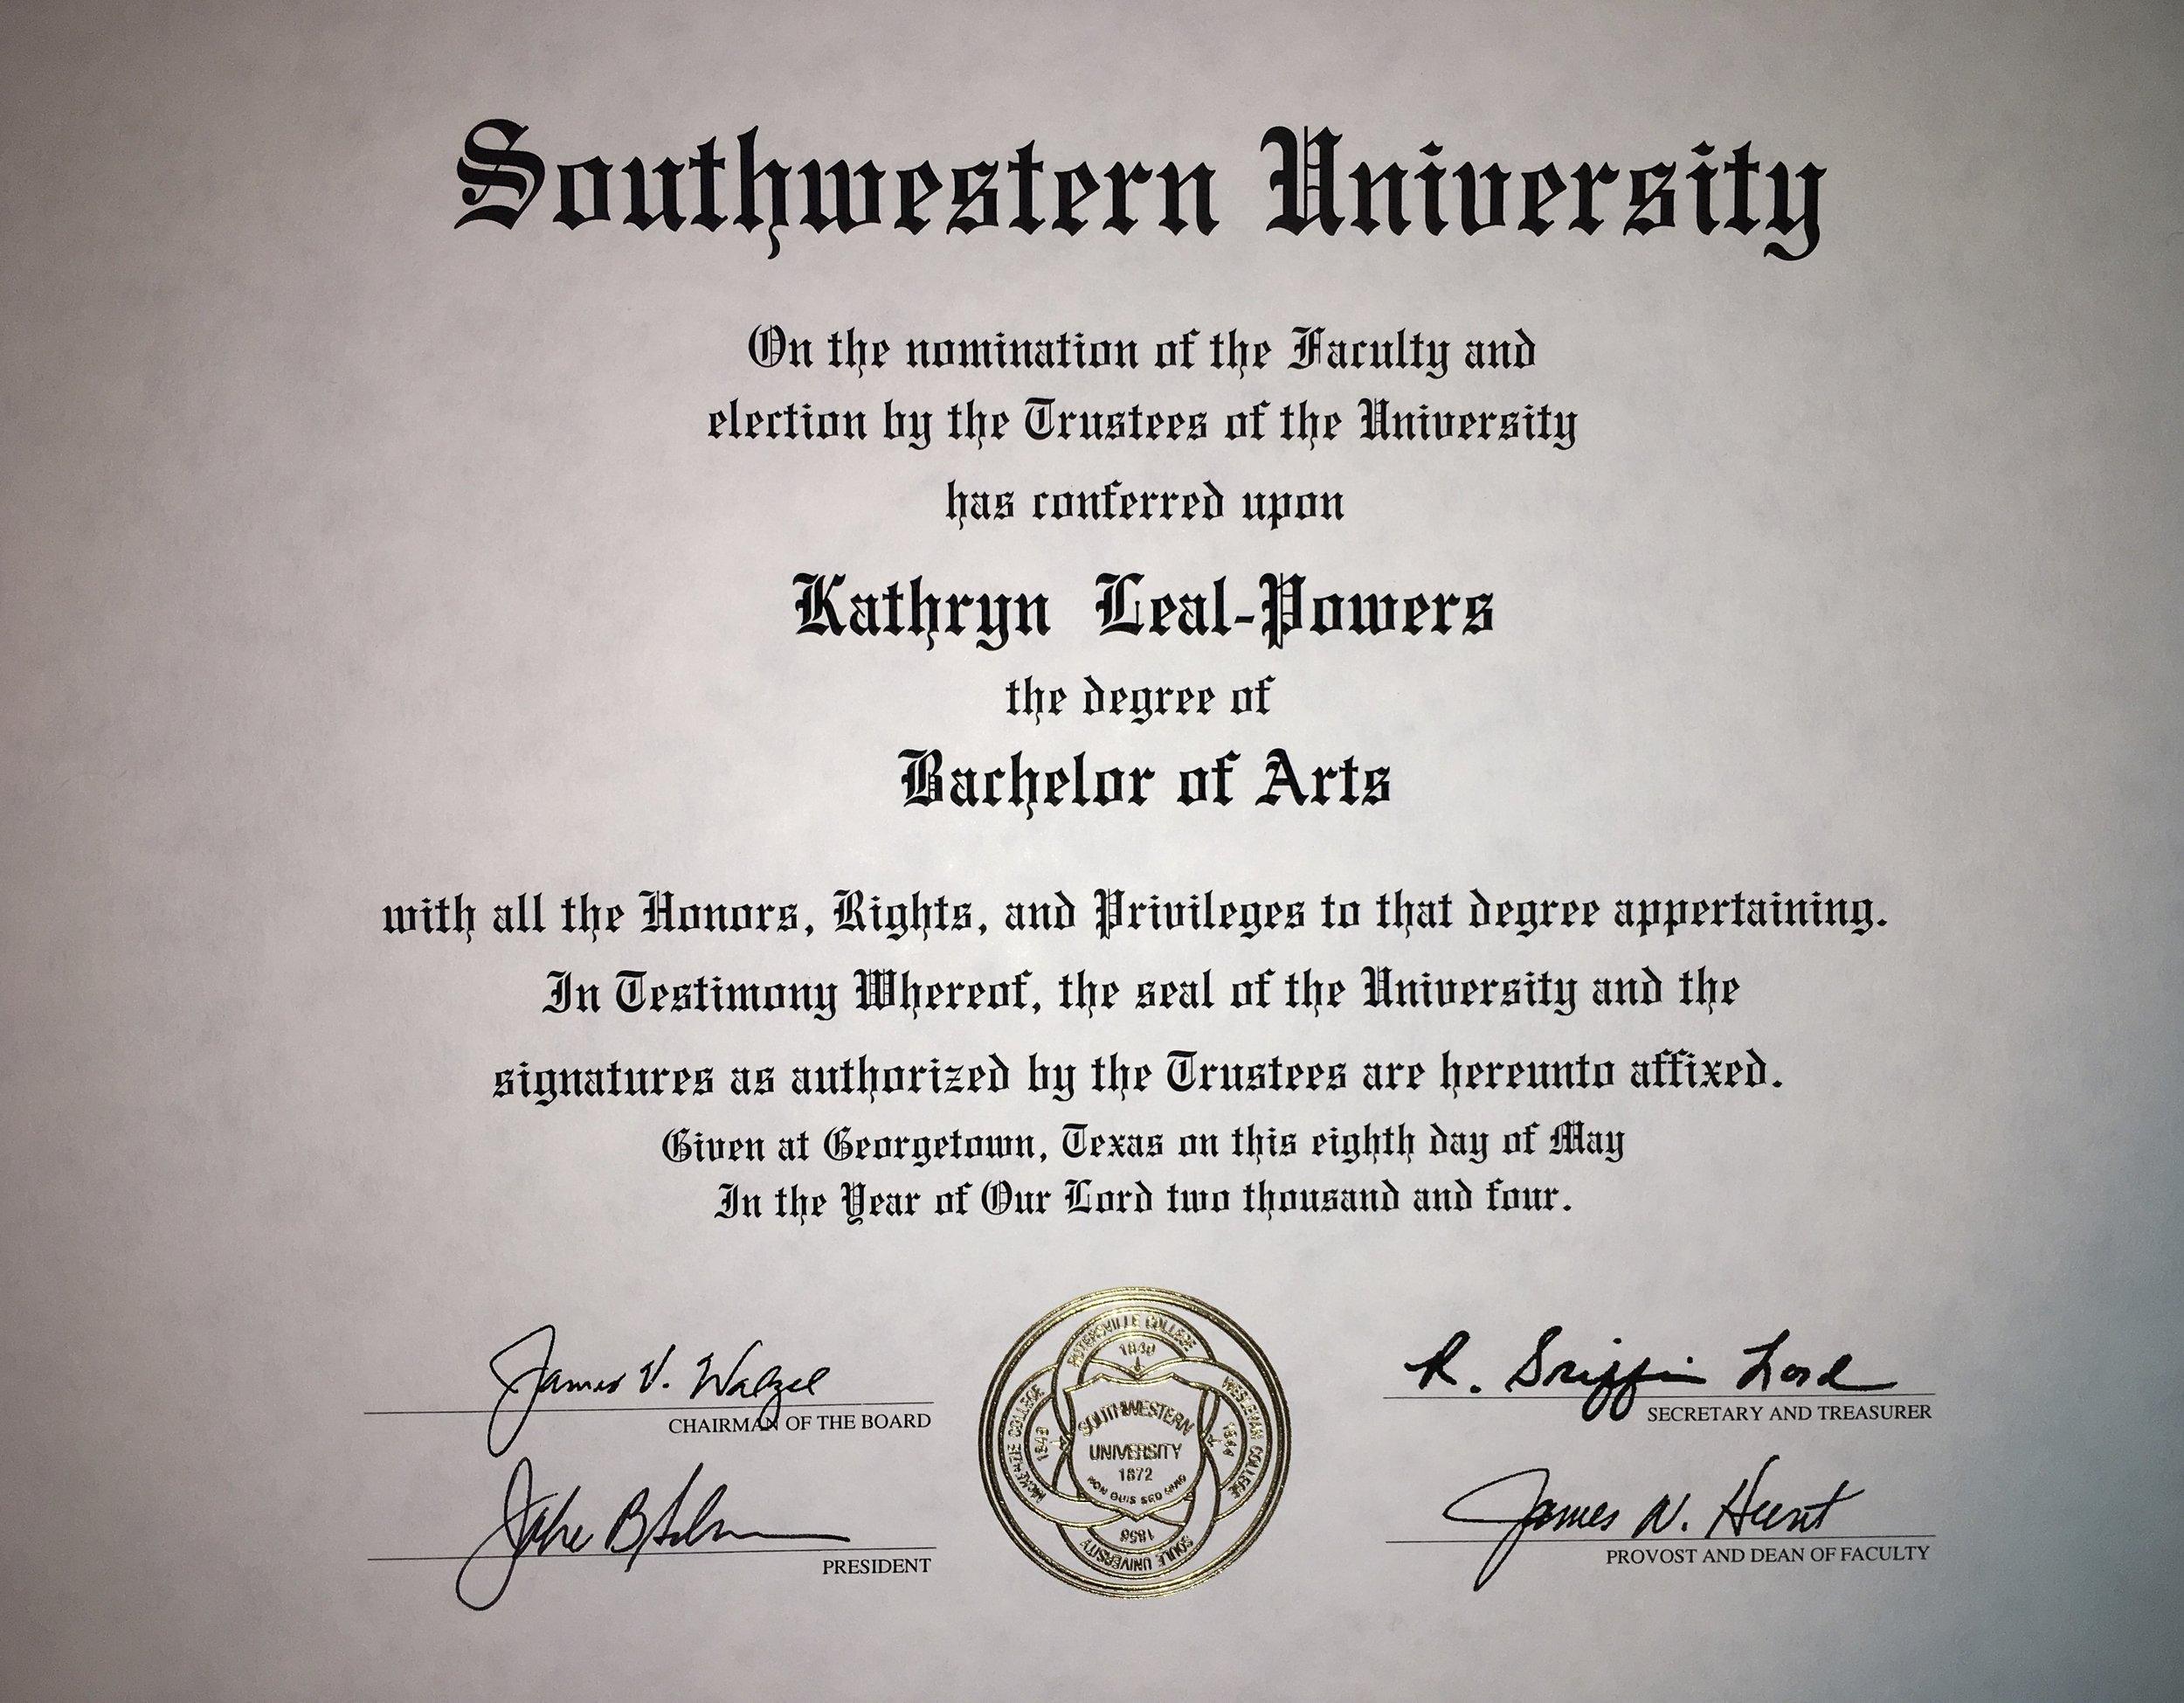 2004 Graduating Class, B.A. major in Studio Art and minor in Art History.